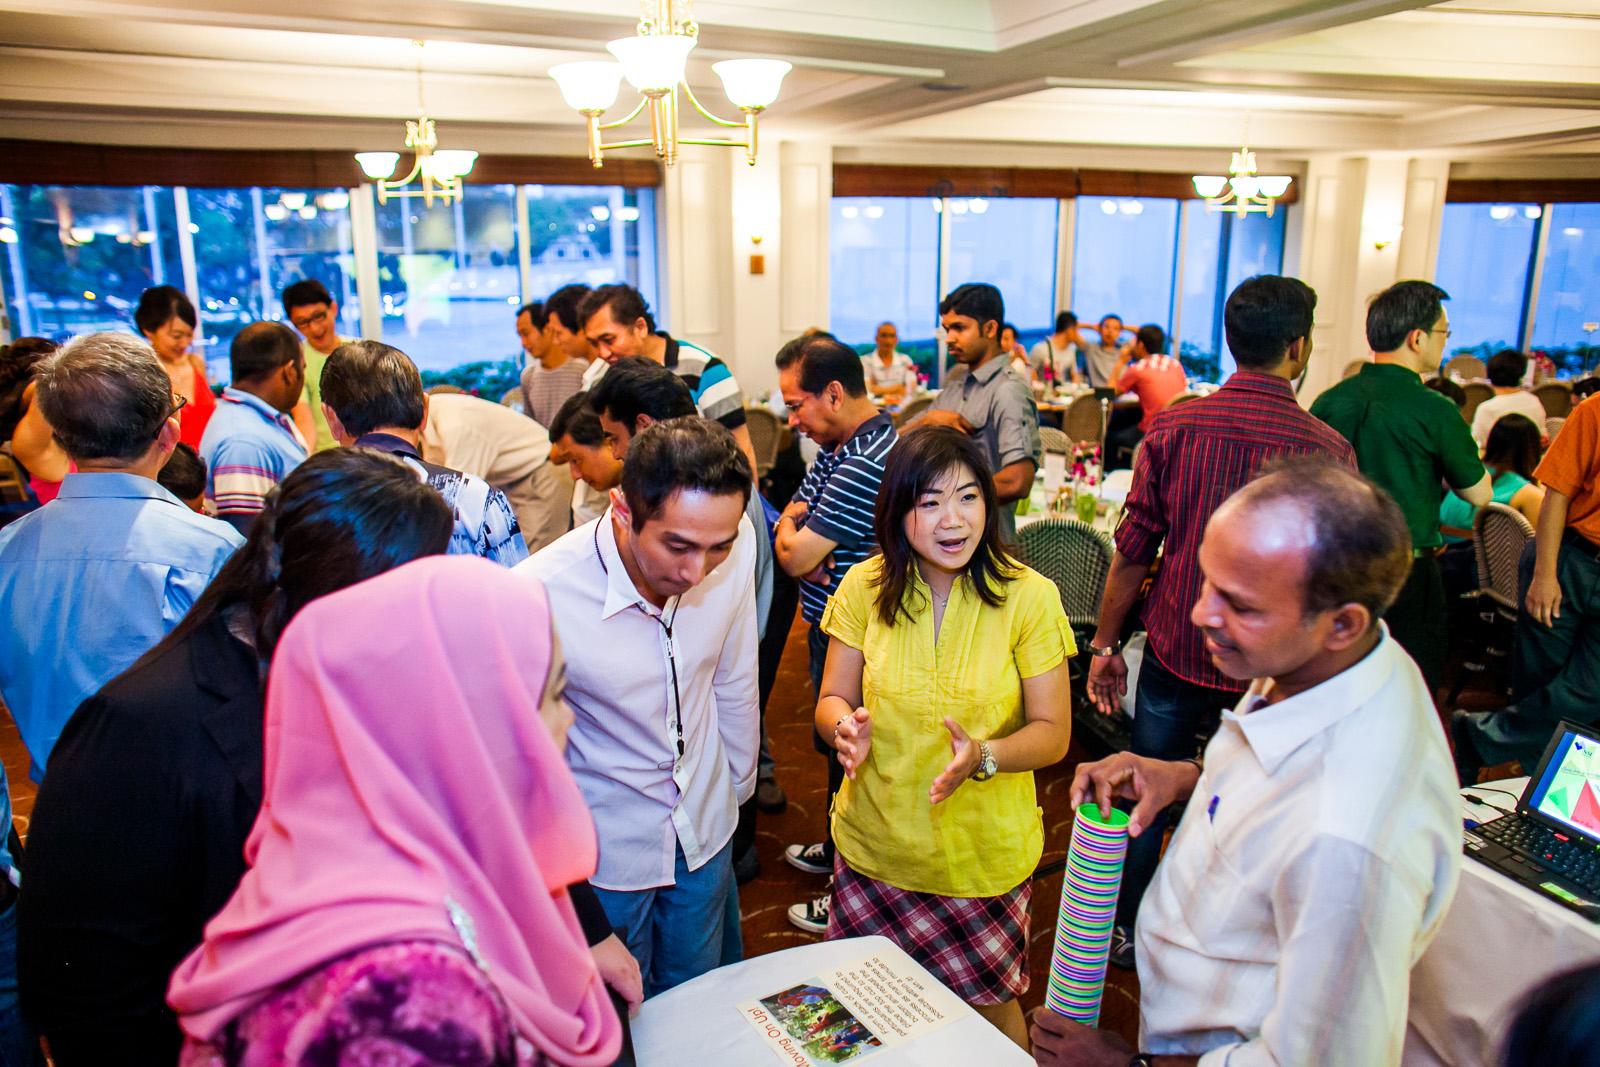 Event Photographer - Halcyon Media